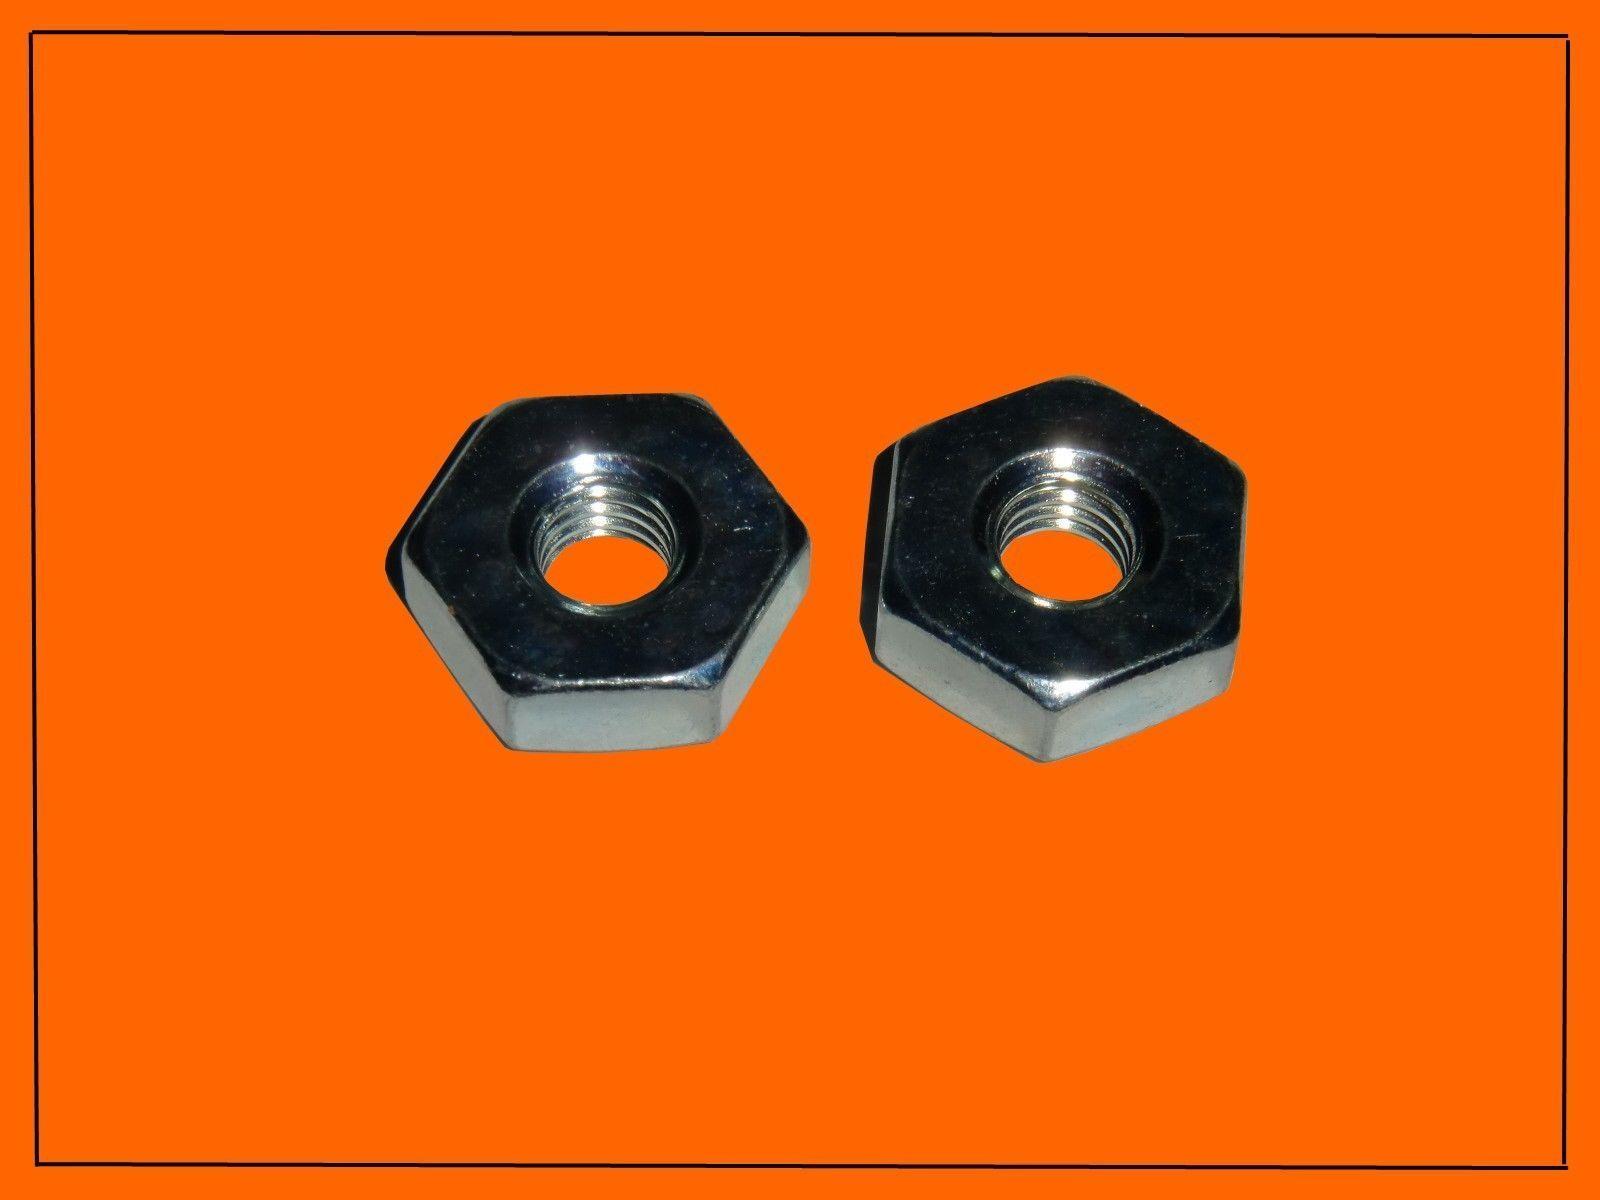 Ouda pernos de rueda dentada tapa sirve para still 020t ms200 MS 200 ms200t MS 200